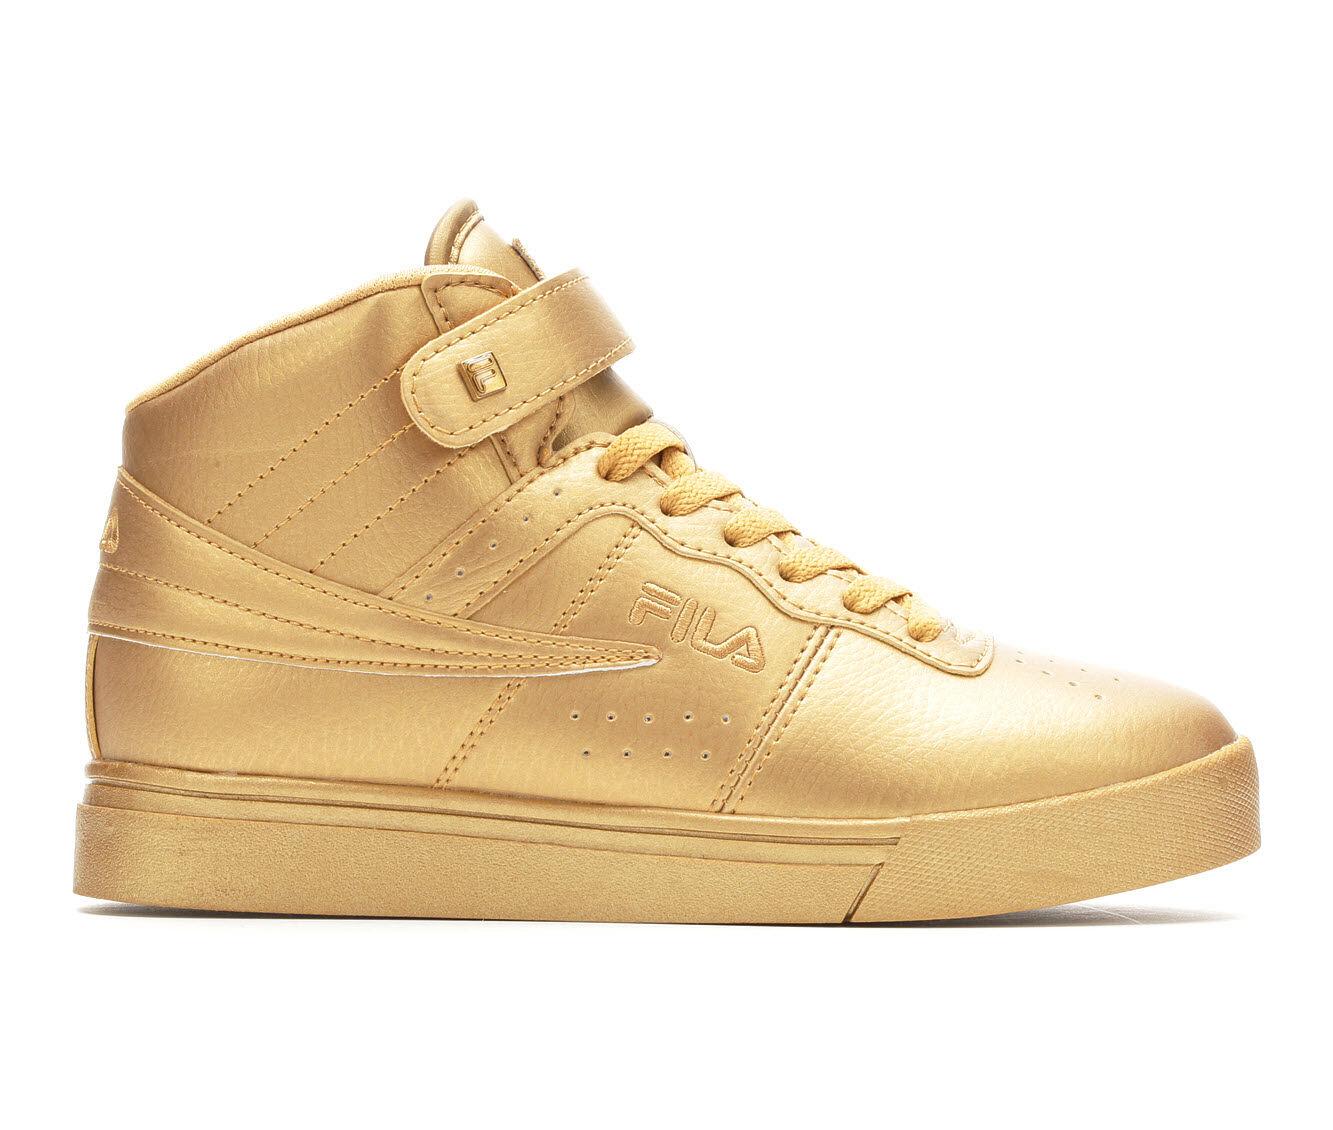 Women's Fila Vulc 13 MP Metallic Stars Basketball Shoes Gold